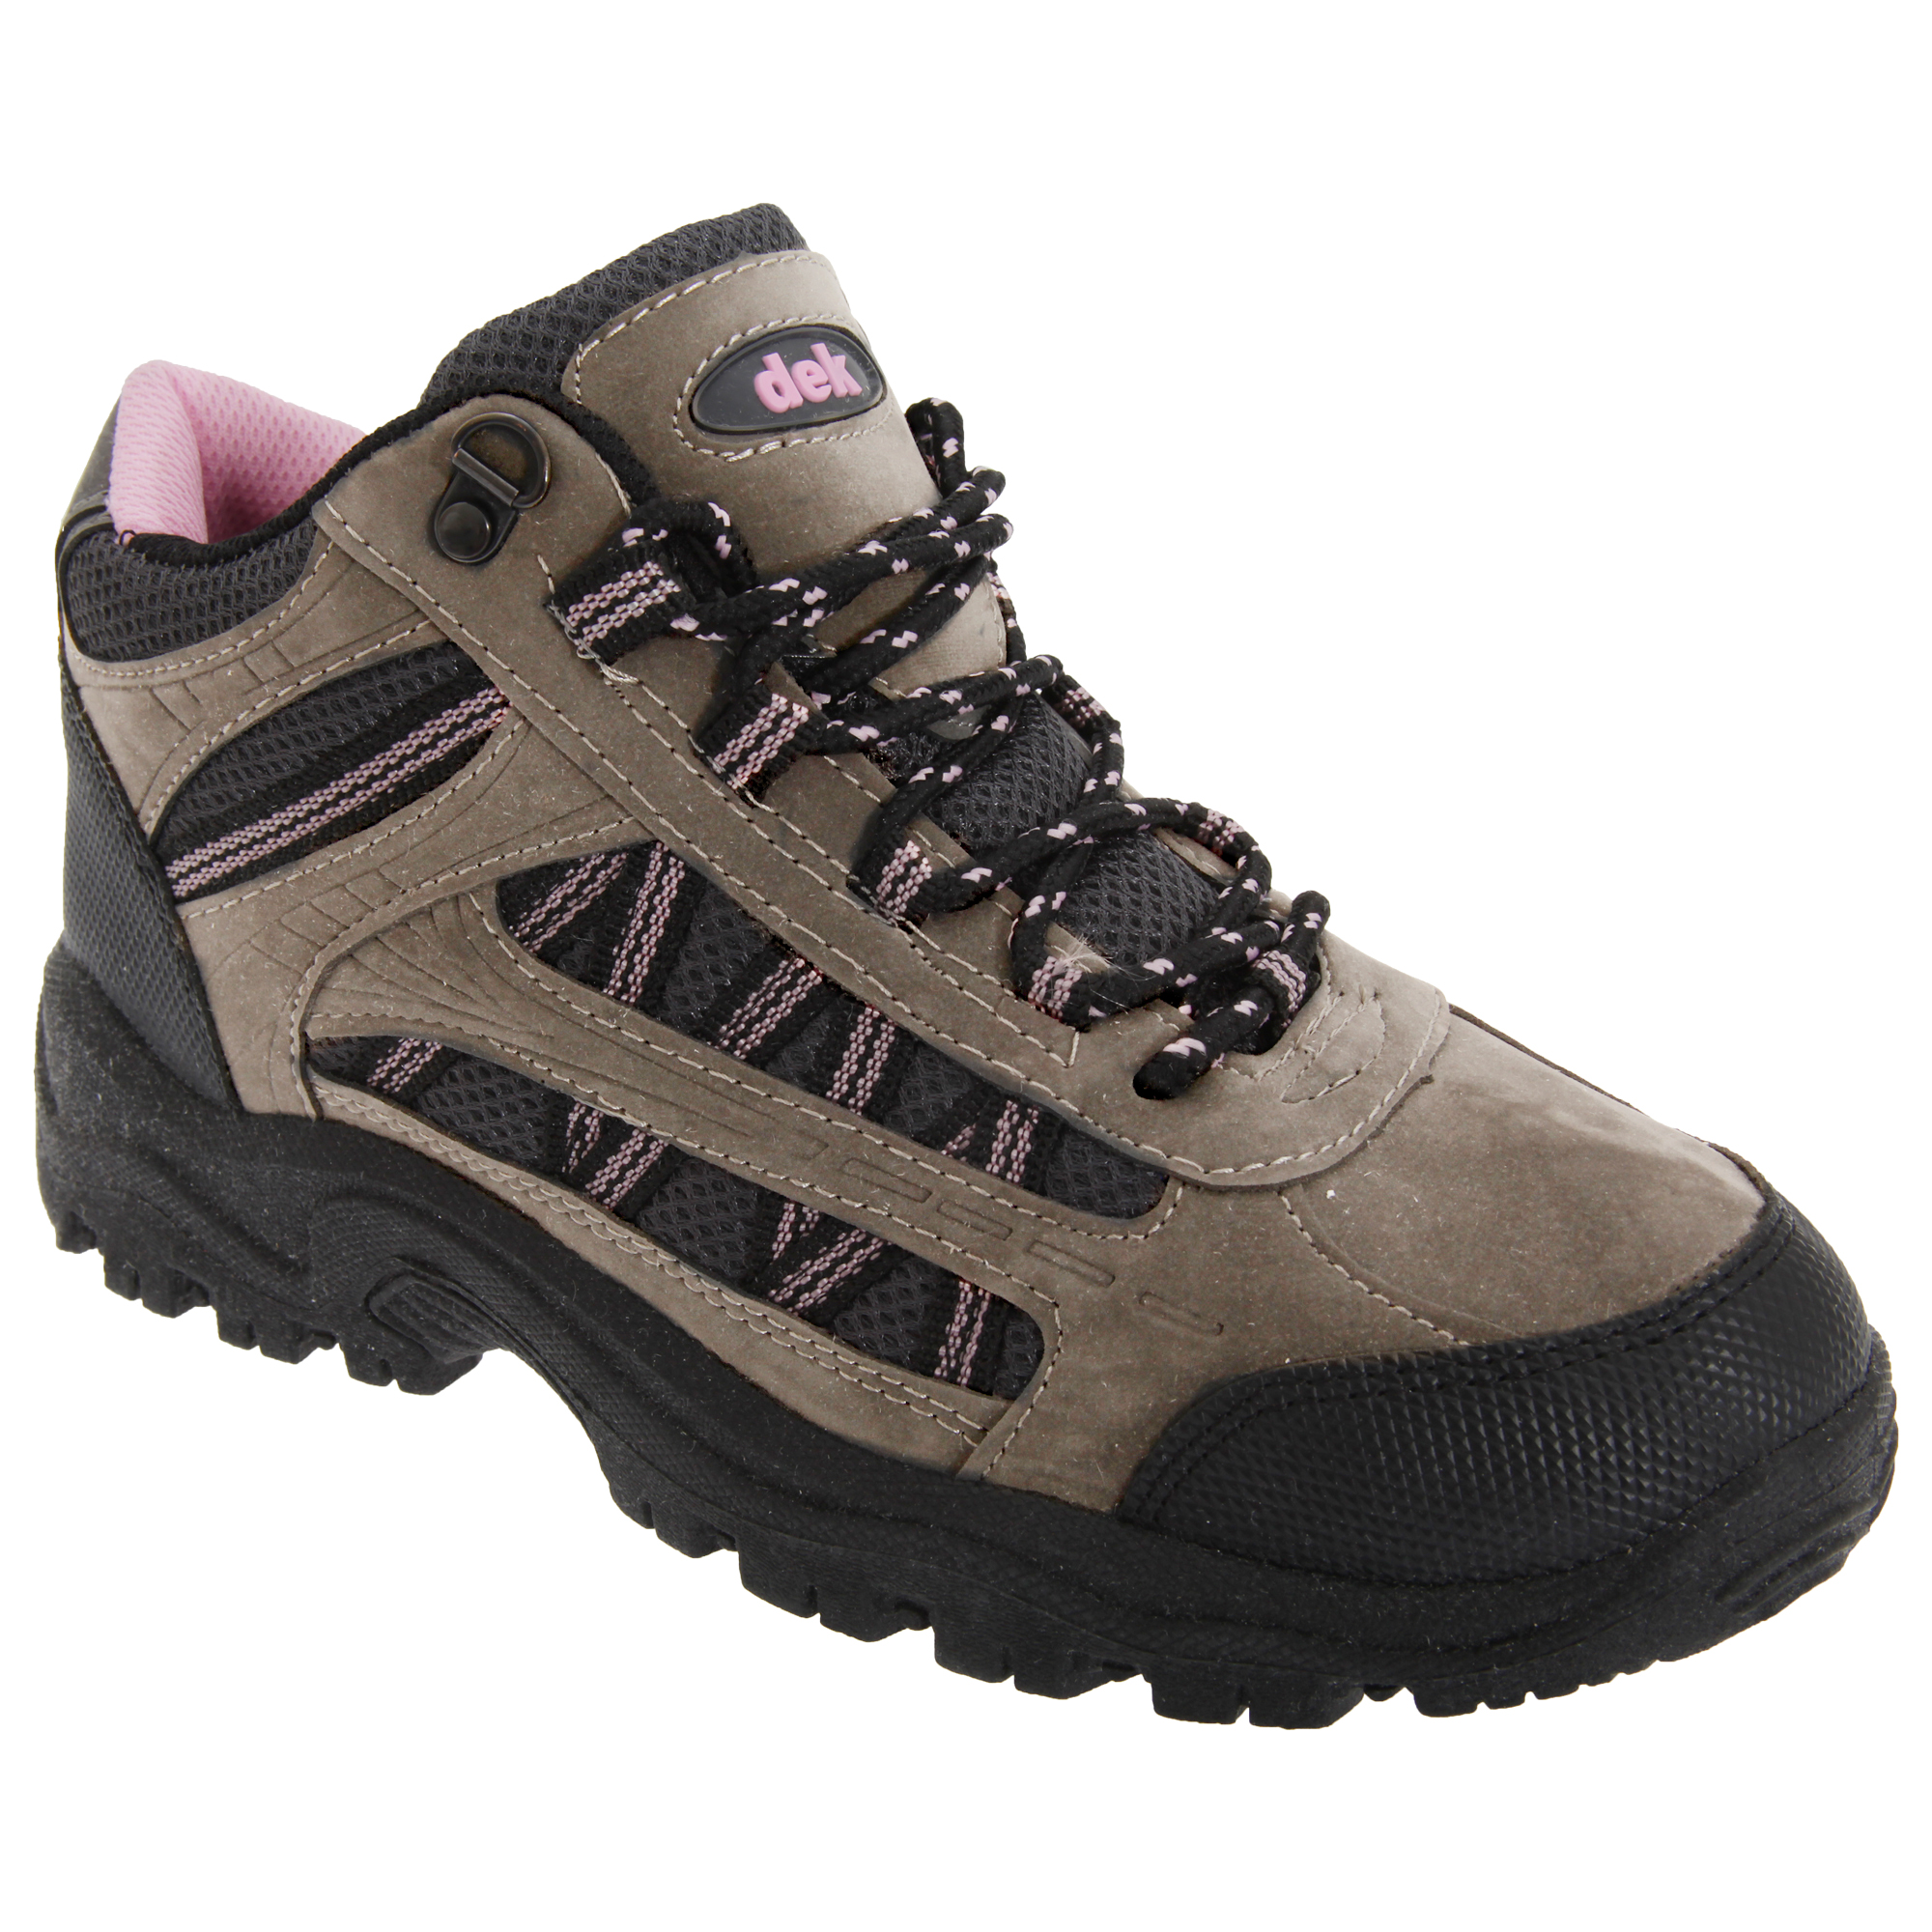 Dek Womens/Ladies Grassmere Lace-Up Ankle Trek & Trail Boots (5 UK) (Grey/Pink)